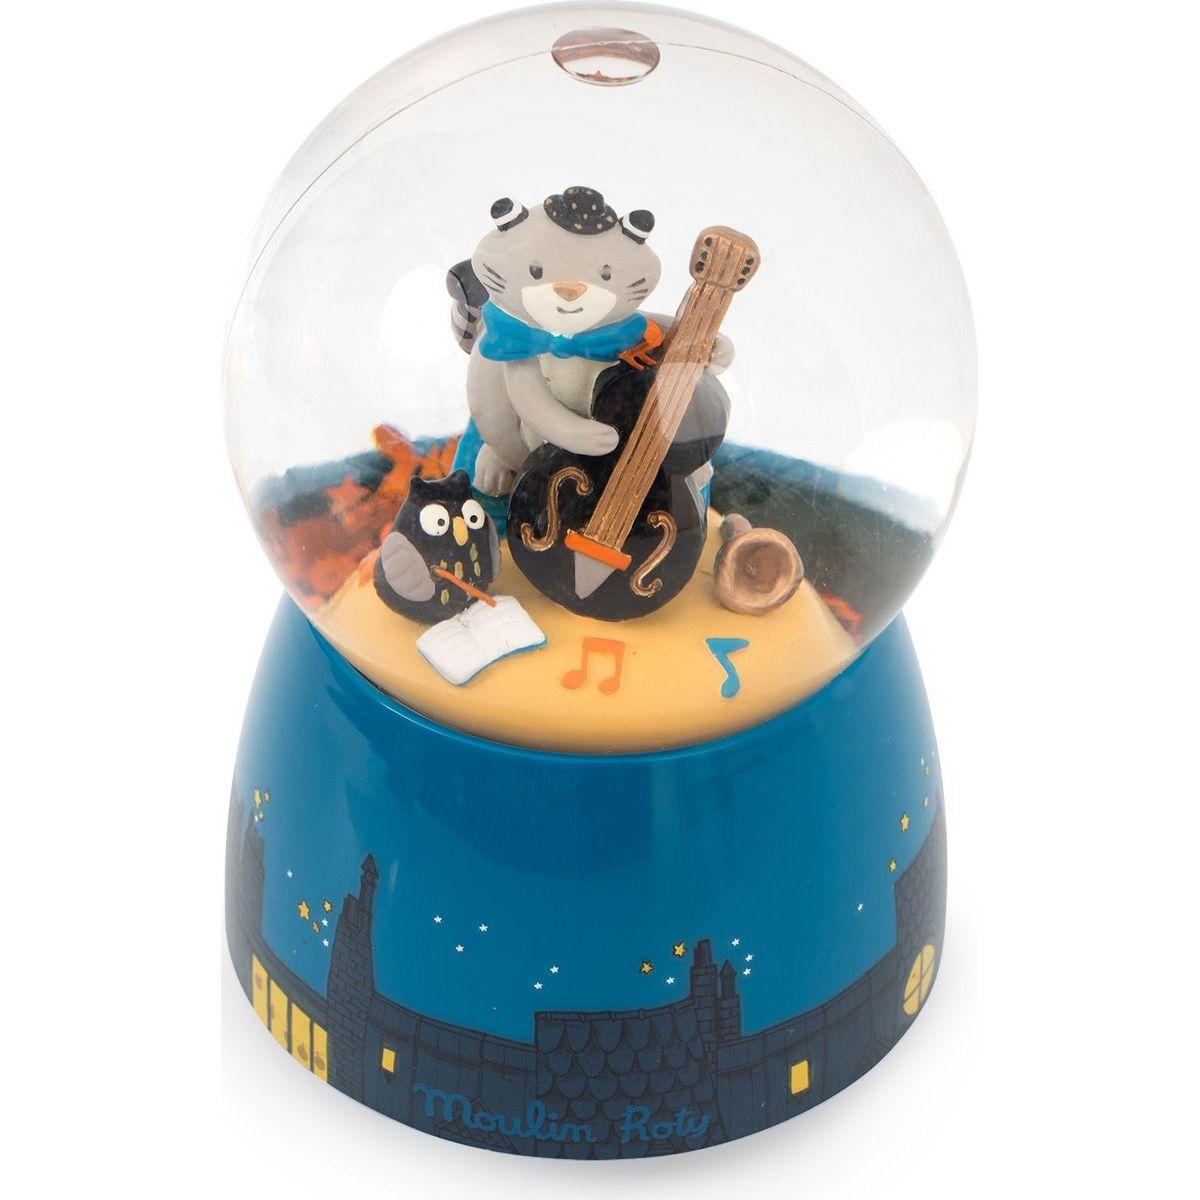 Moulin Roty Sněžítko a hracia skrinka